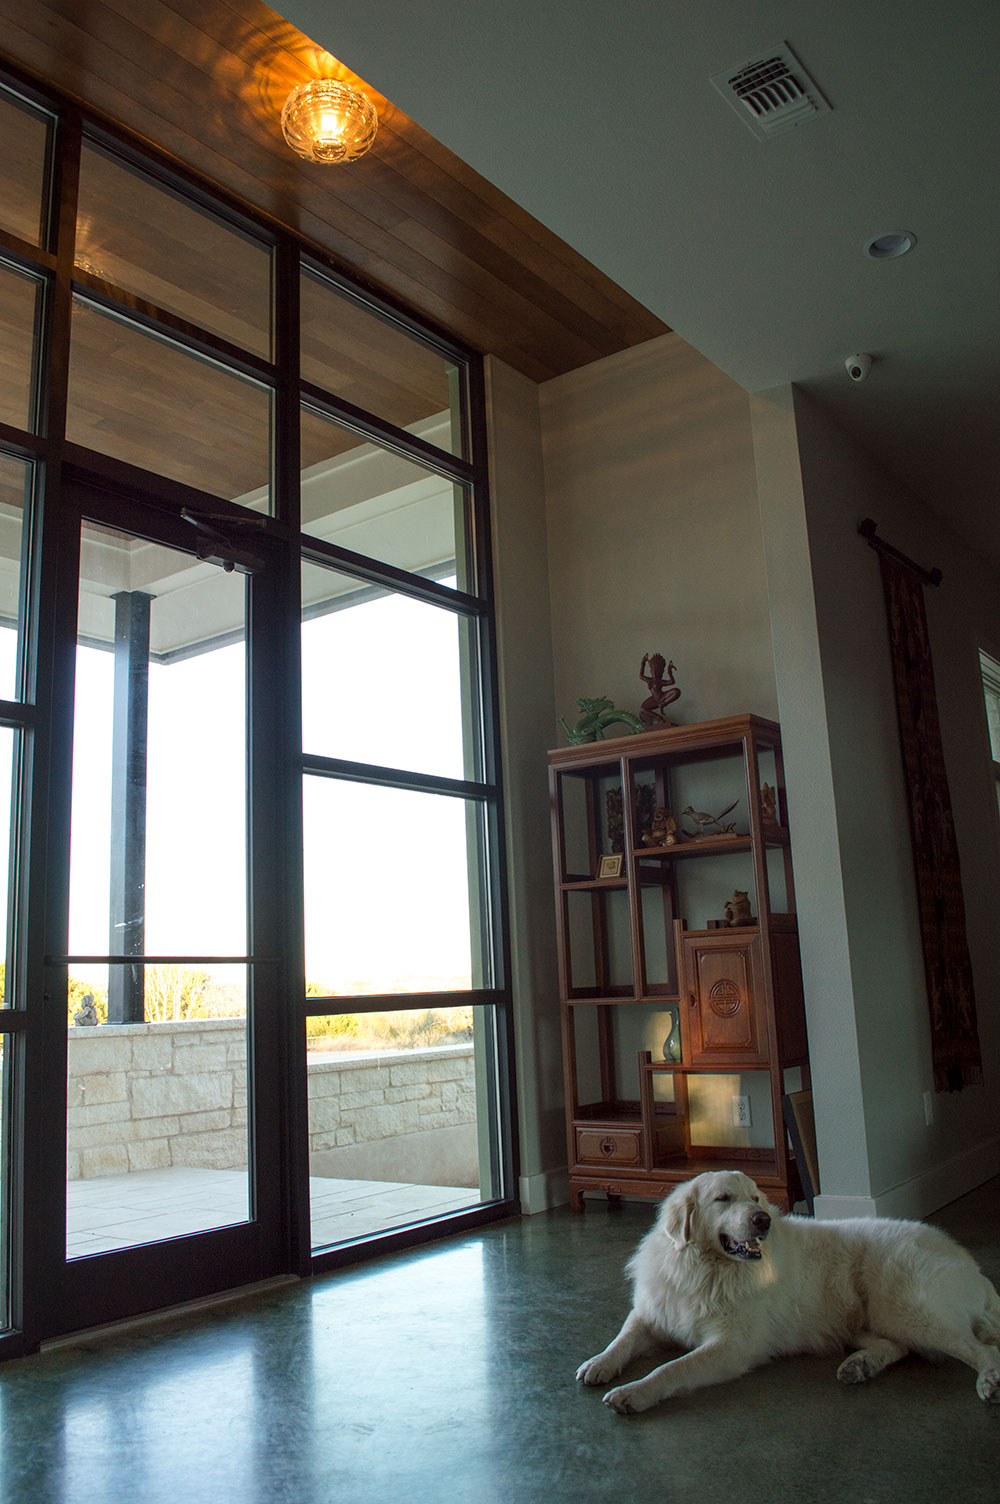 Ketterman-foyer-with-family-dog-web.jpg